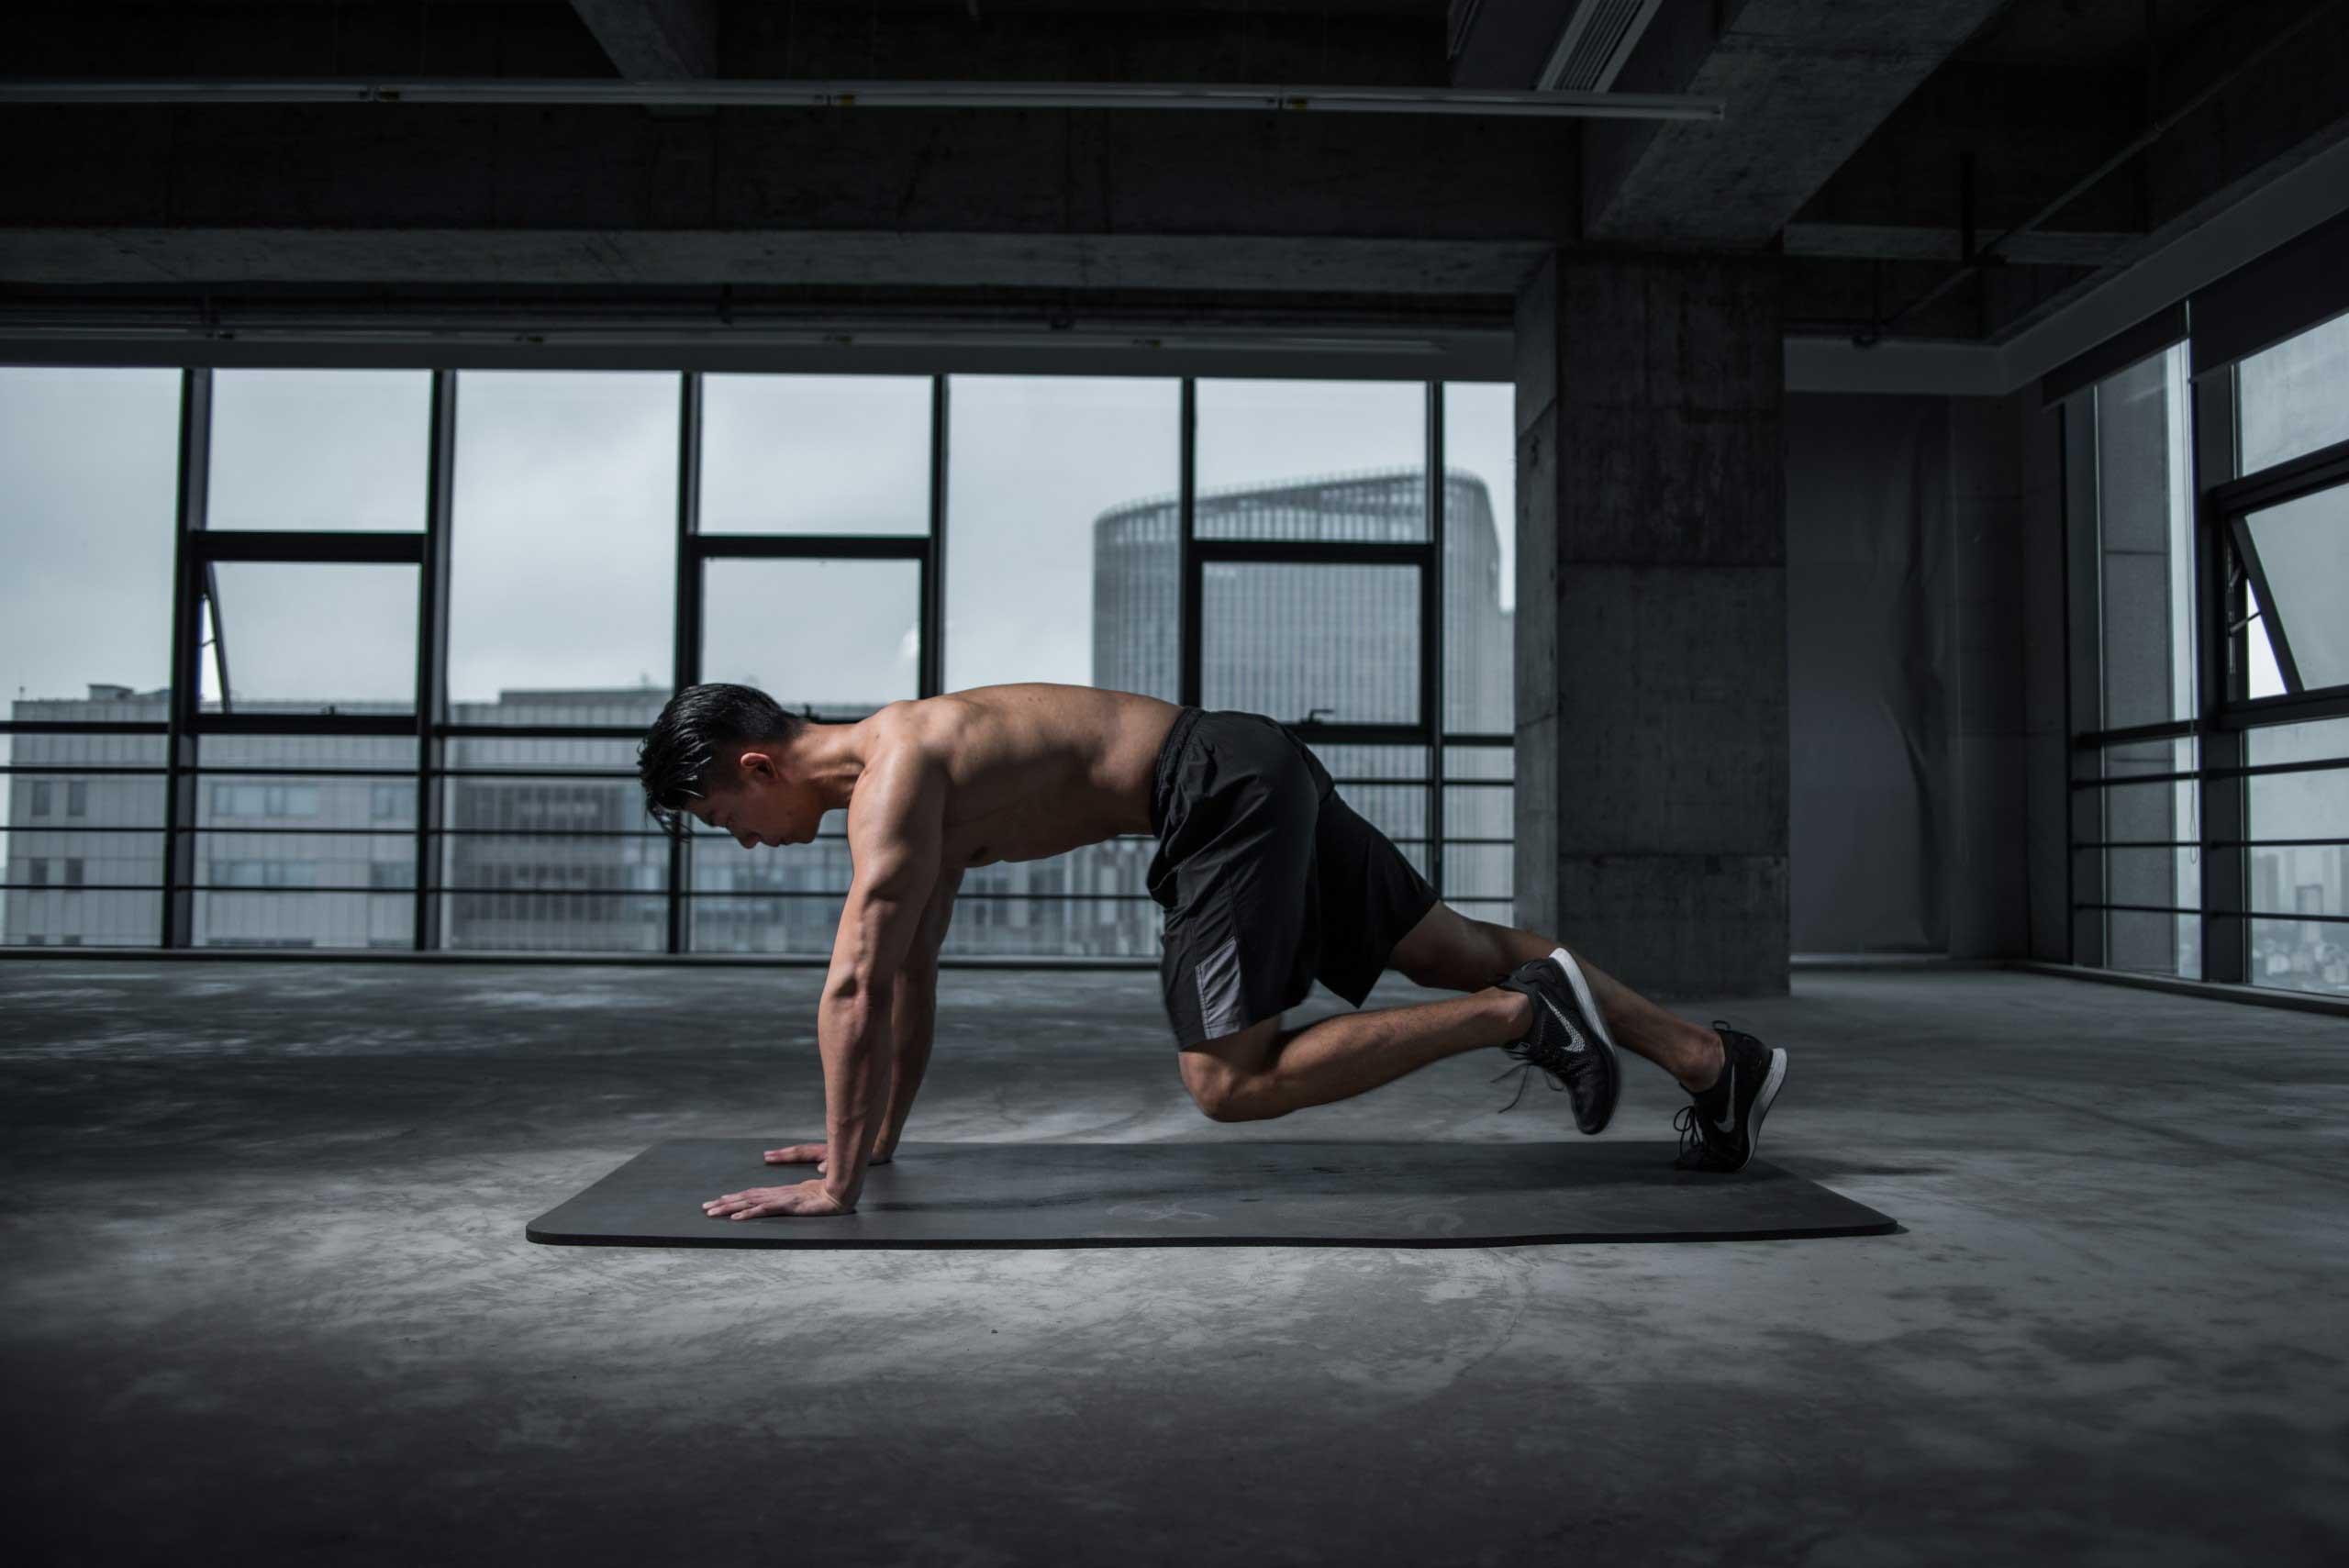 Man doing core exercises